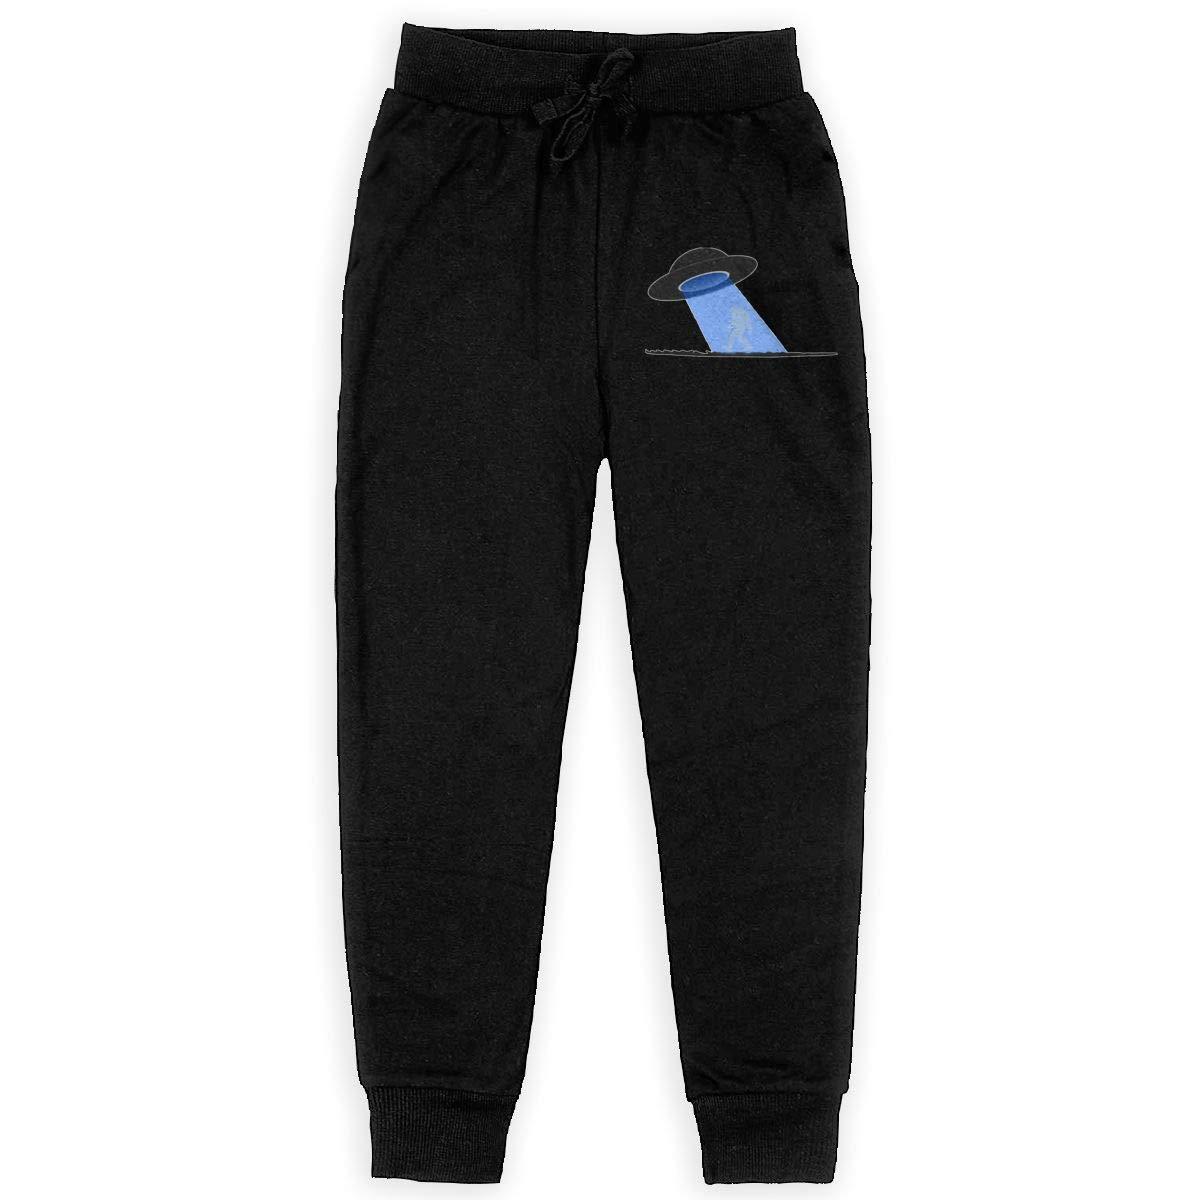 Teenager UFO Bigfoot Teen Sweatpants Active Pants Back Pocket Black